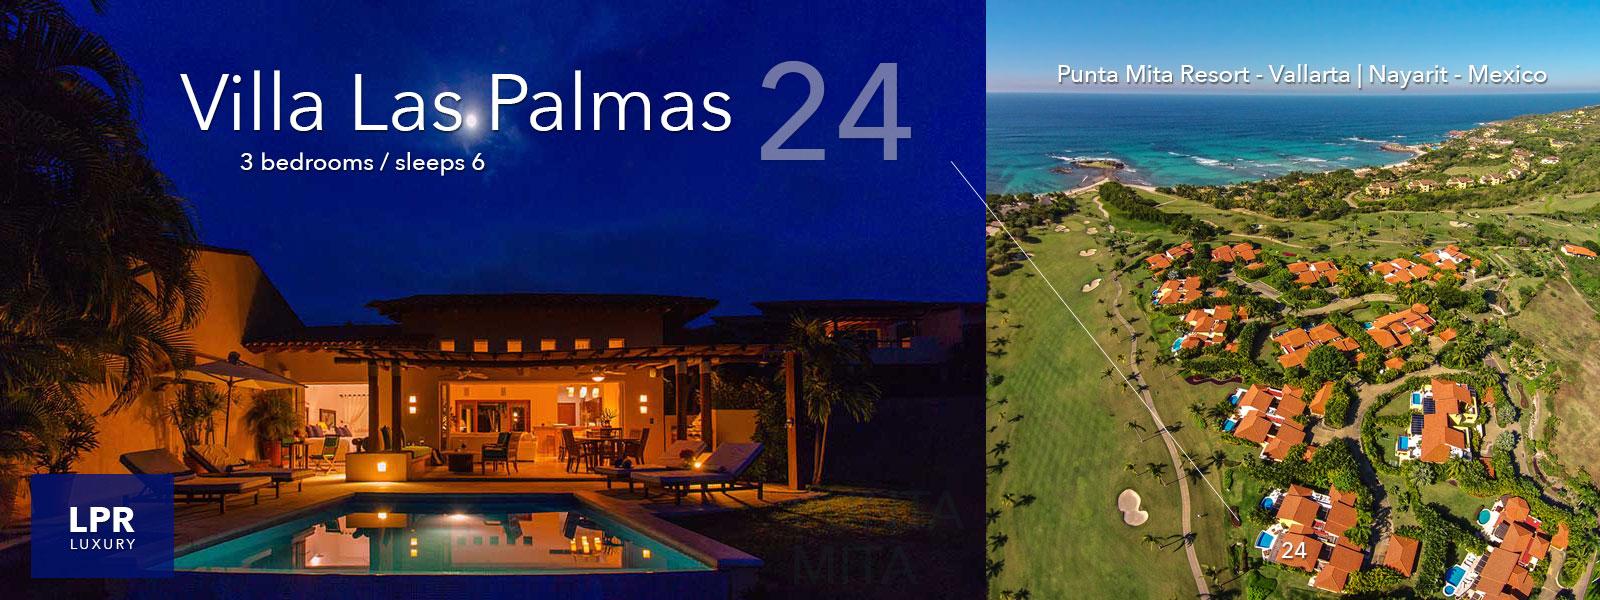 Villa Las Palmas Punta Mita 24 - Punta Mita Mexico